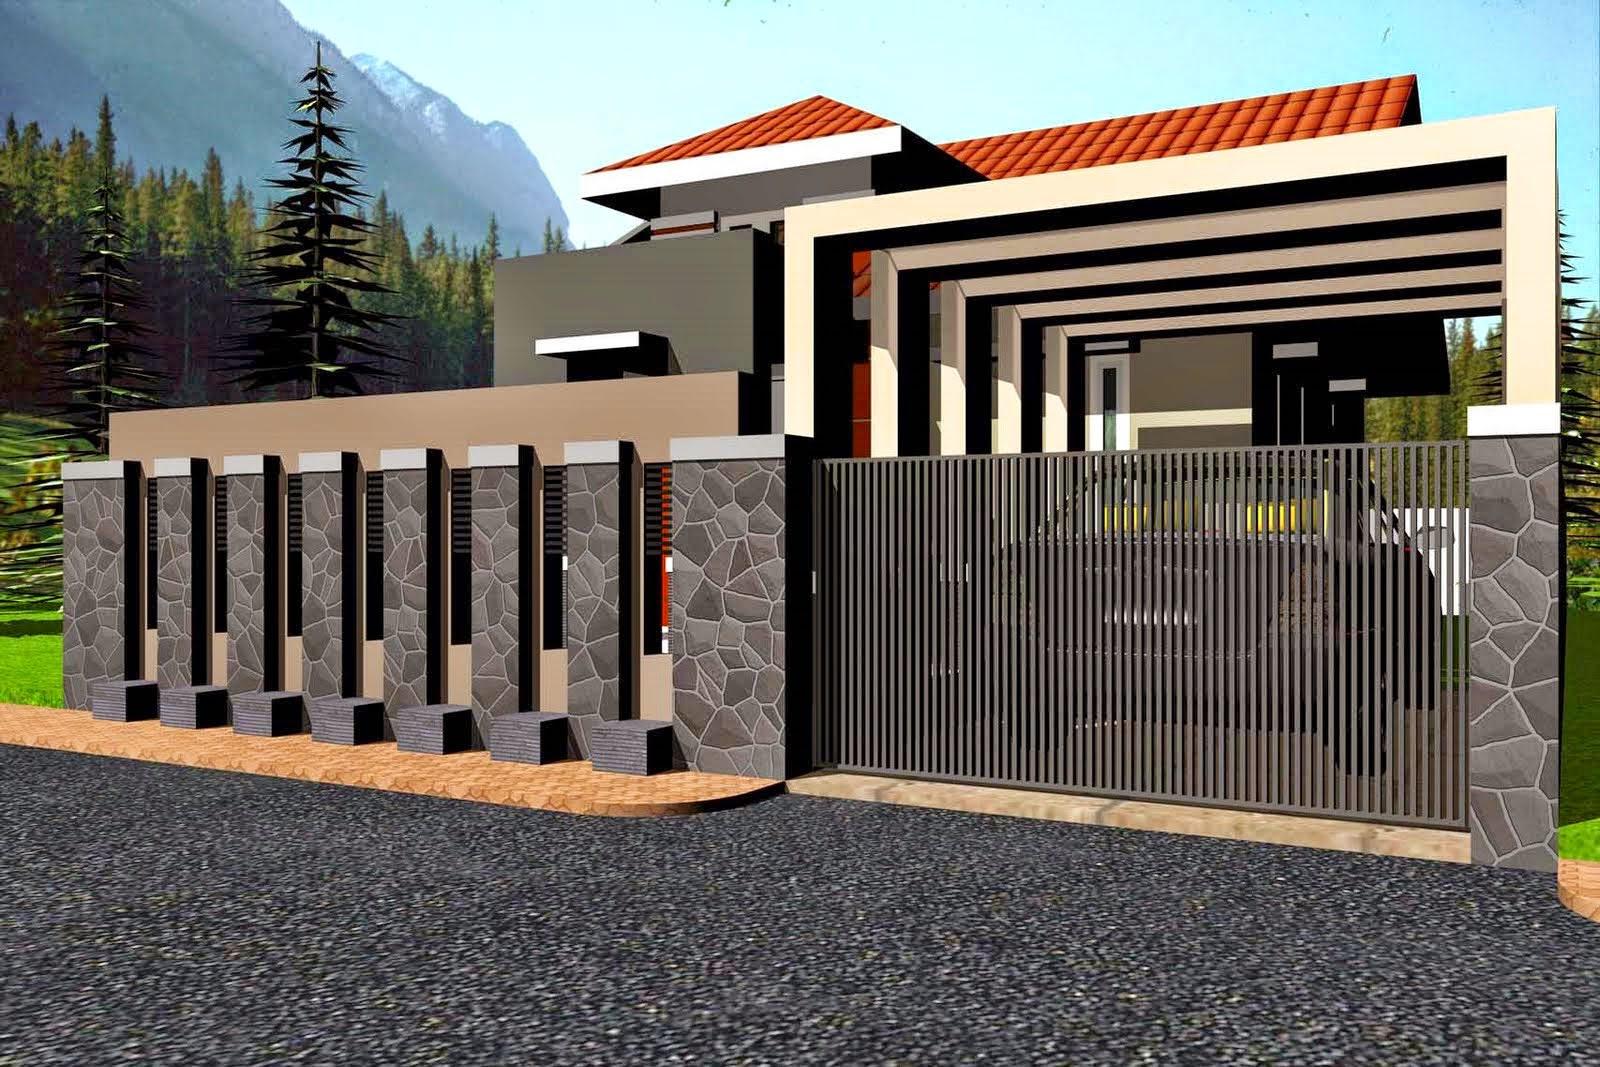 Kumpulan Desain Pagar Rumah Minimalis Bali Kumpulan Desain Rumah